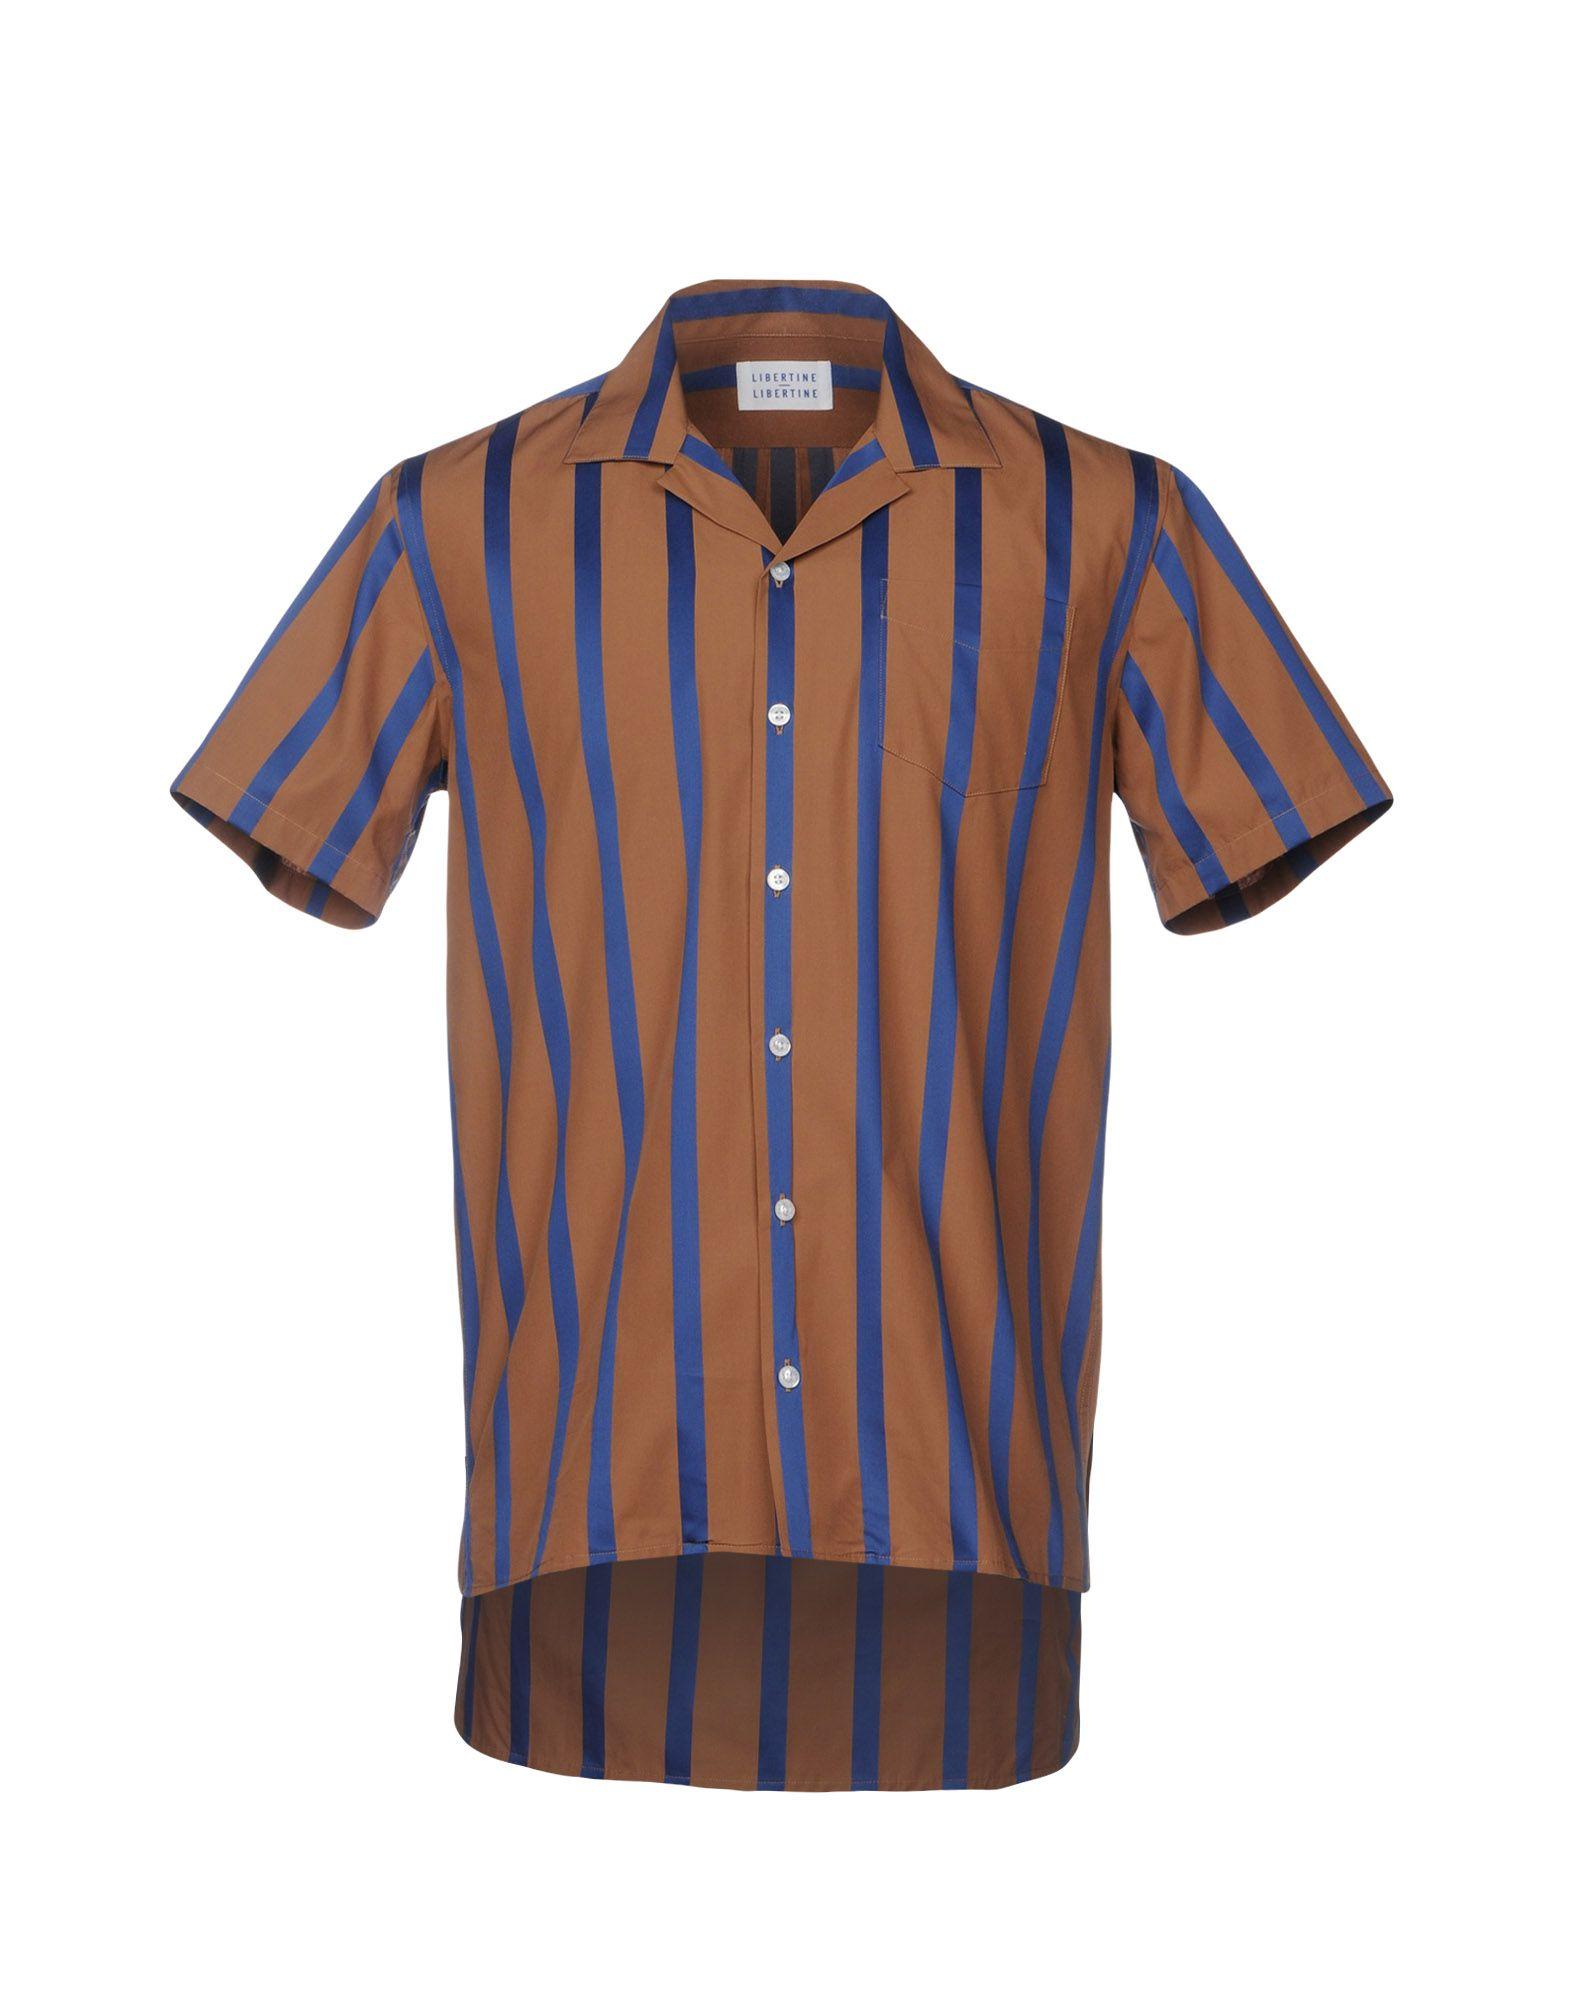 LIBERTINE-LIBERTINE Striped Shirt in Cocoa